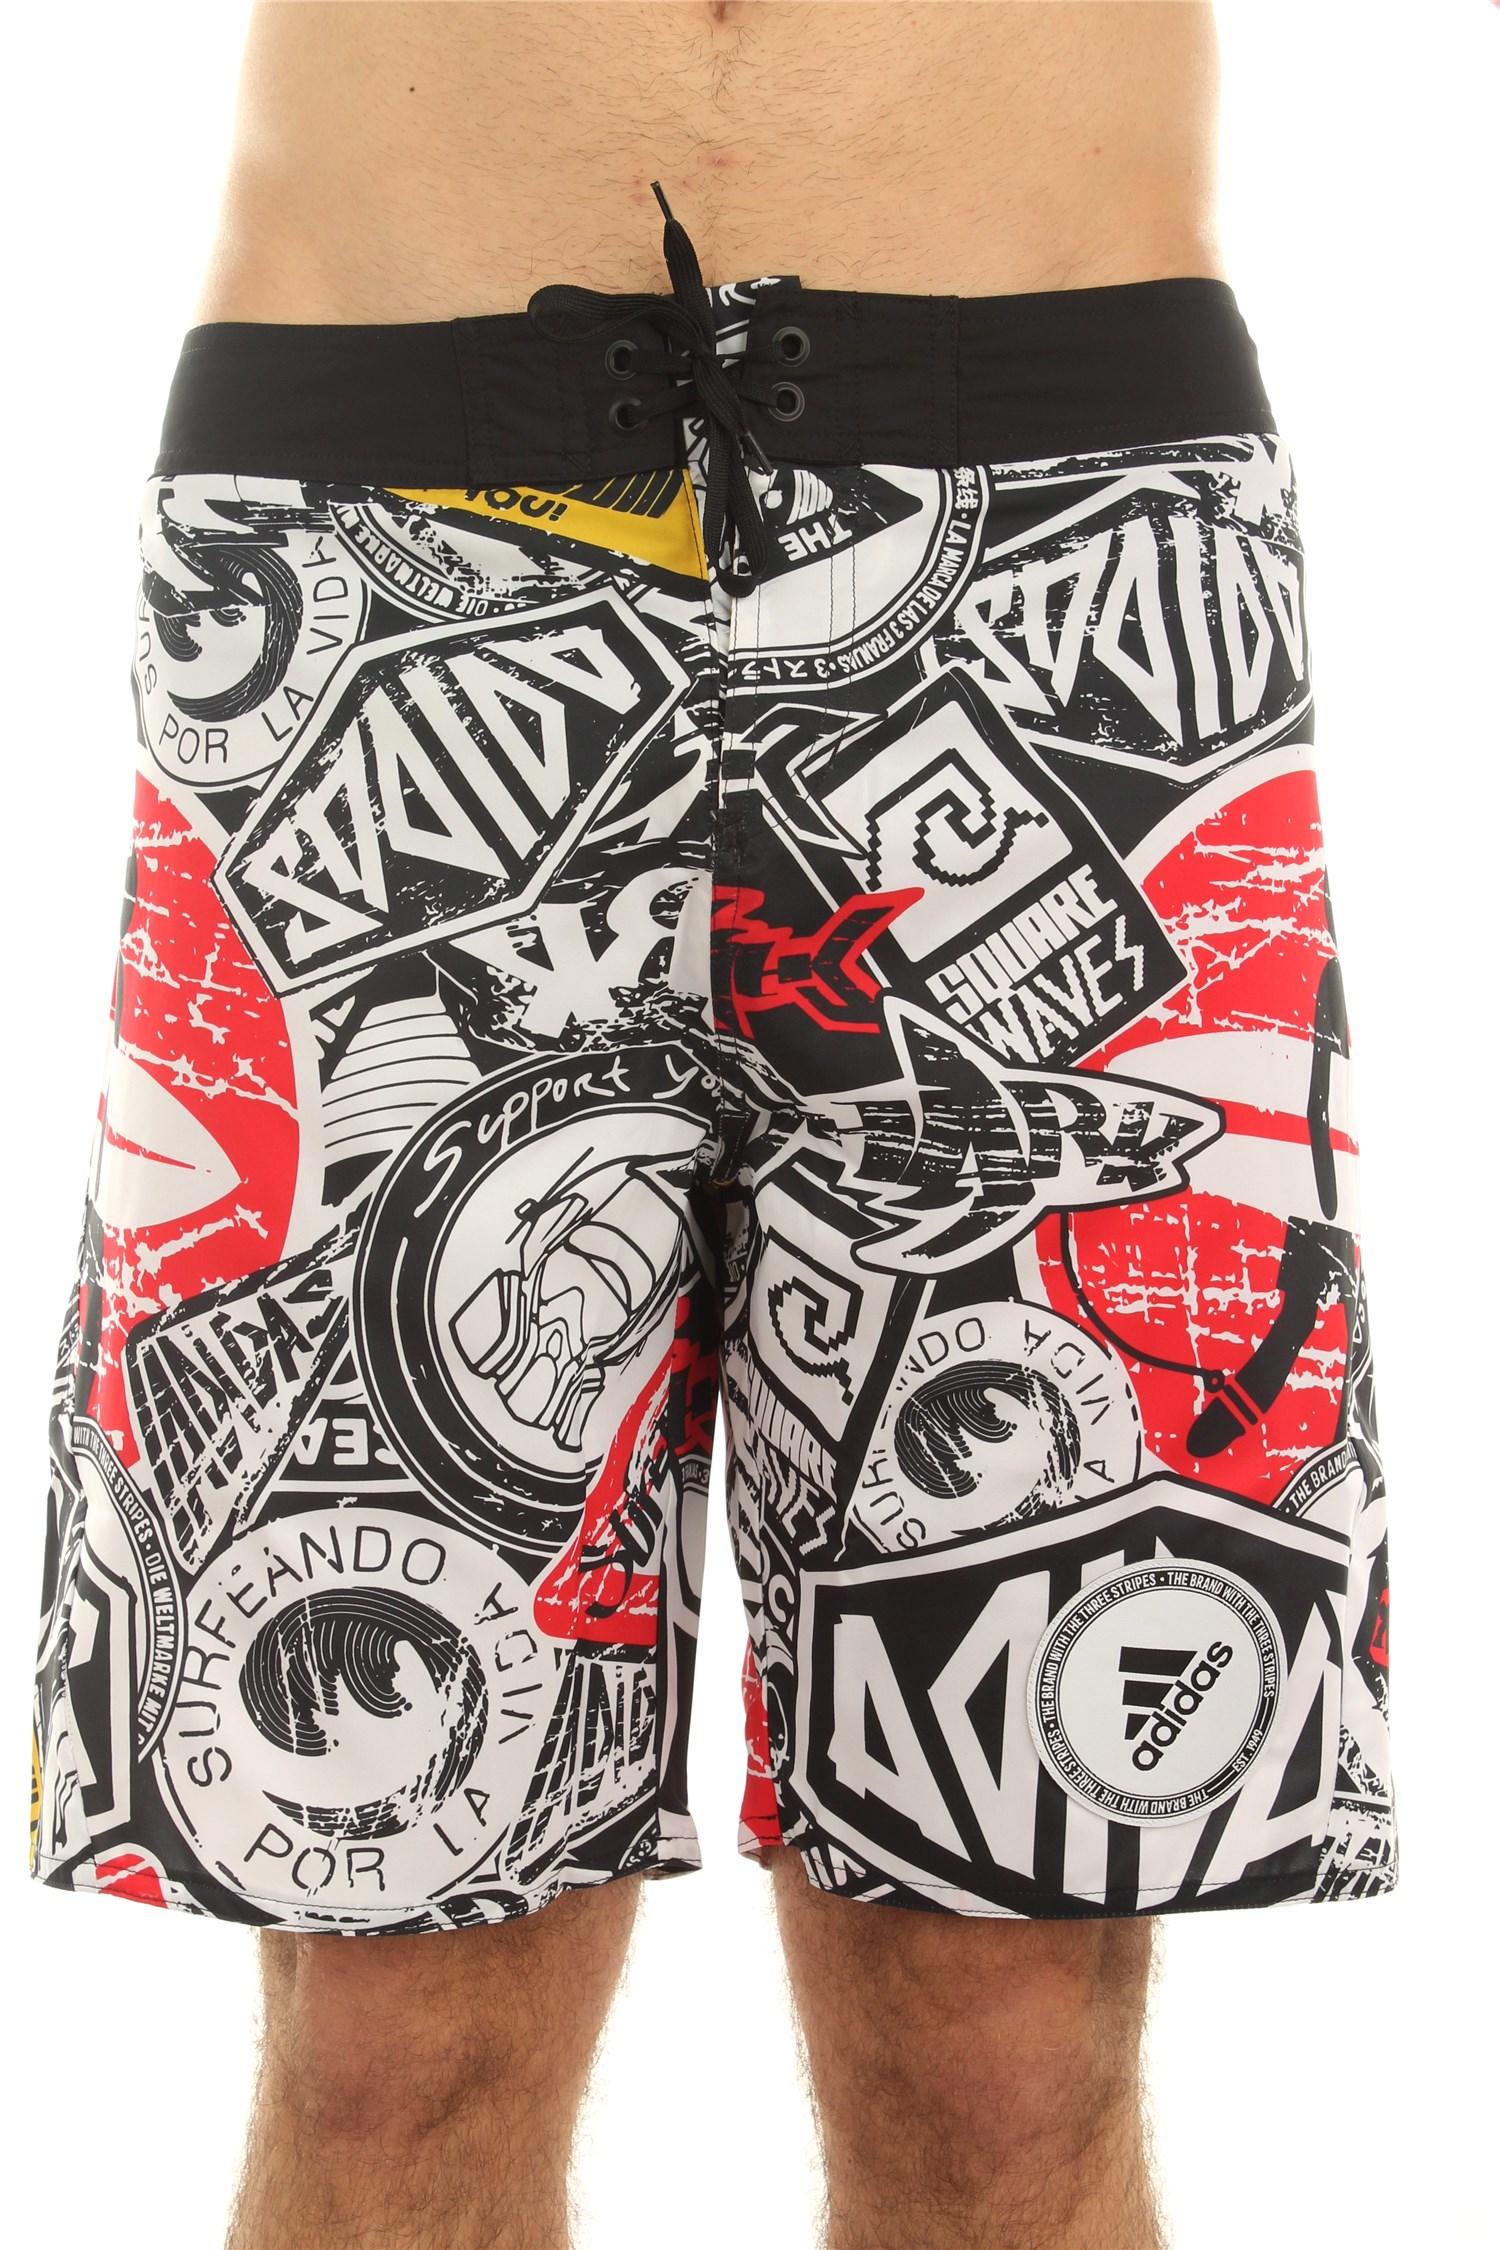 Adidas Swimwear Sea shorts Man Black / white